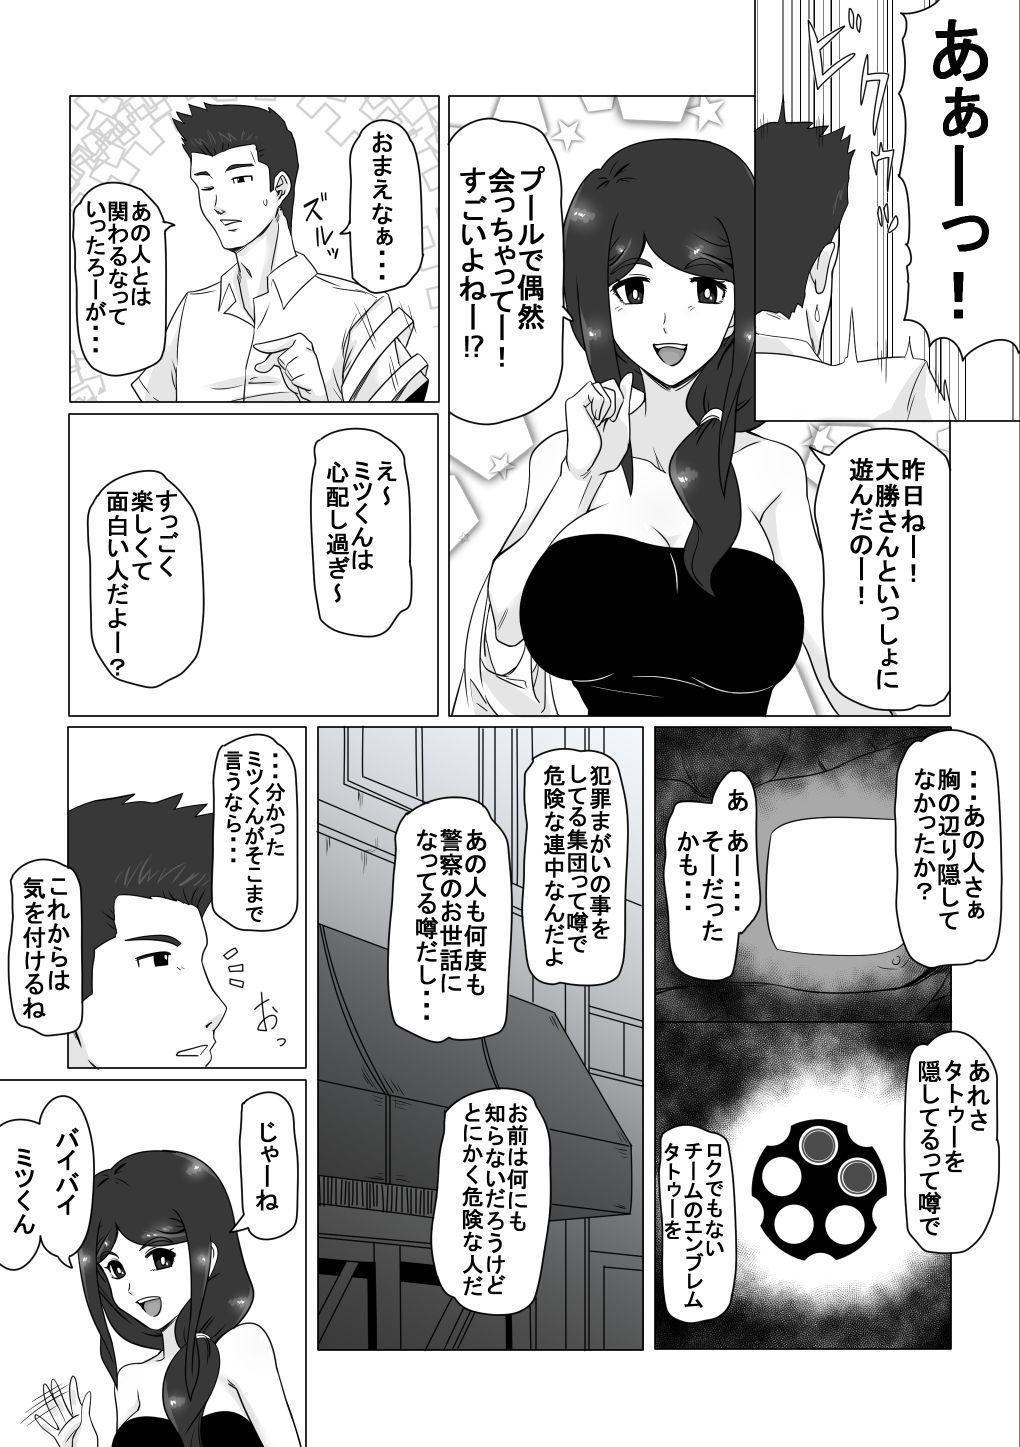 Osananajimi no Natsuyasumi 11